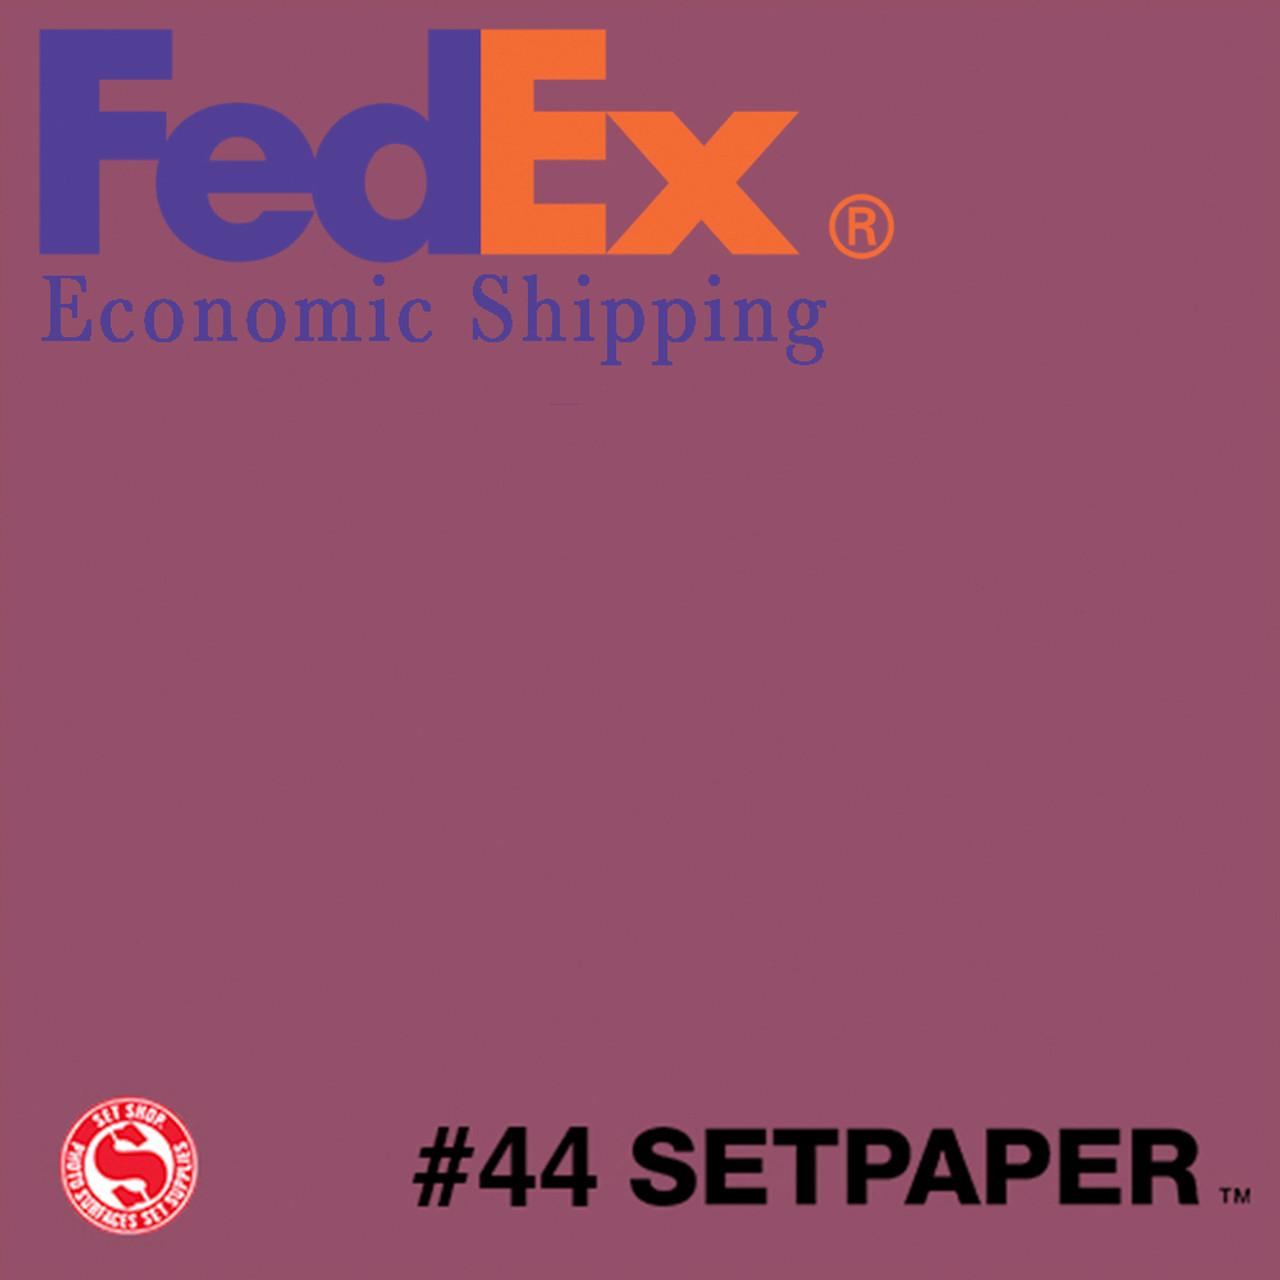 "(ECONOMIC SHIPPING) SETPAPER - PLUM 48"" x 36' (1.3 x 11m)"